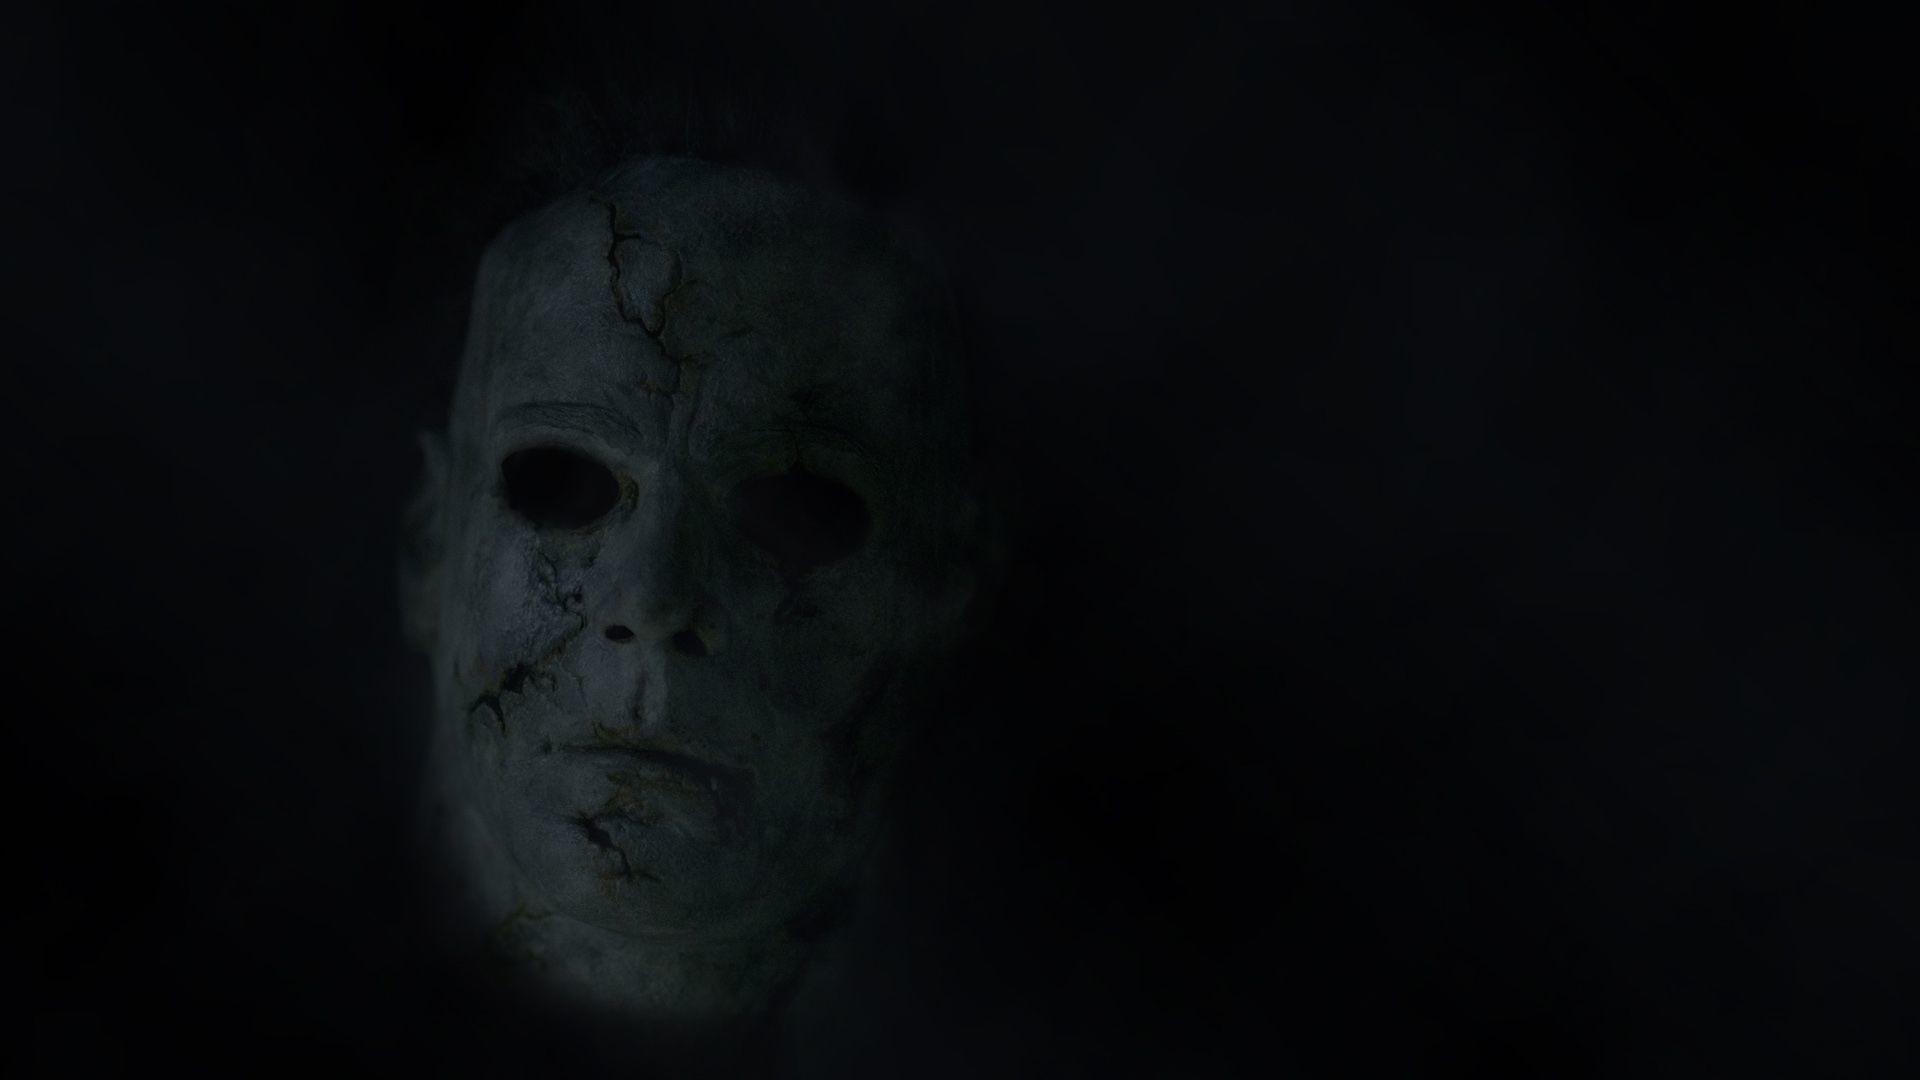 scary-full-hd-background_1.jpg